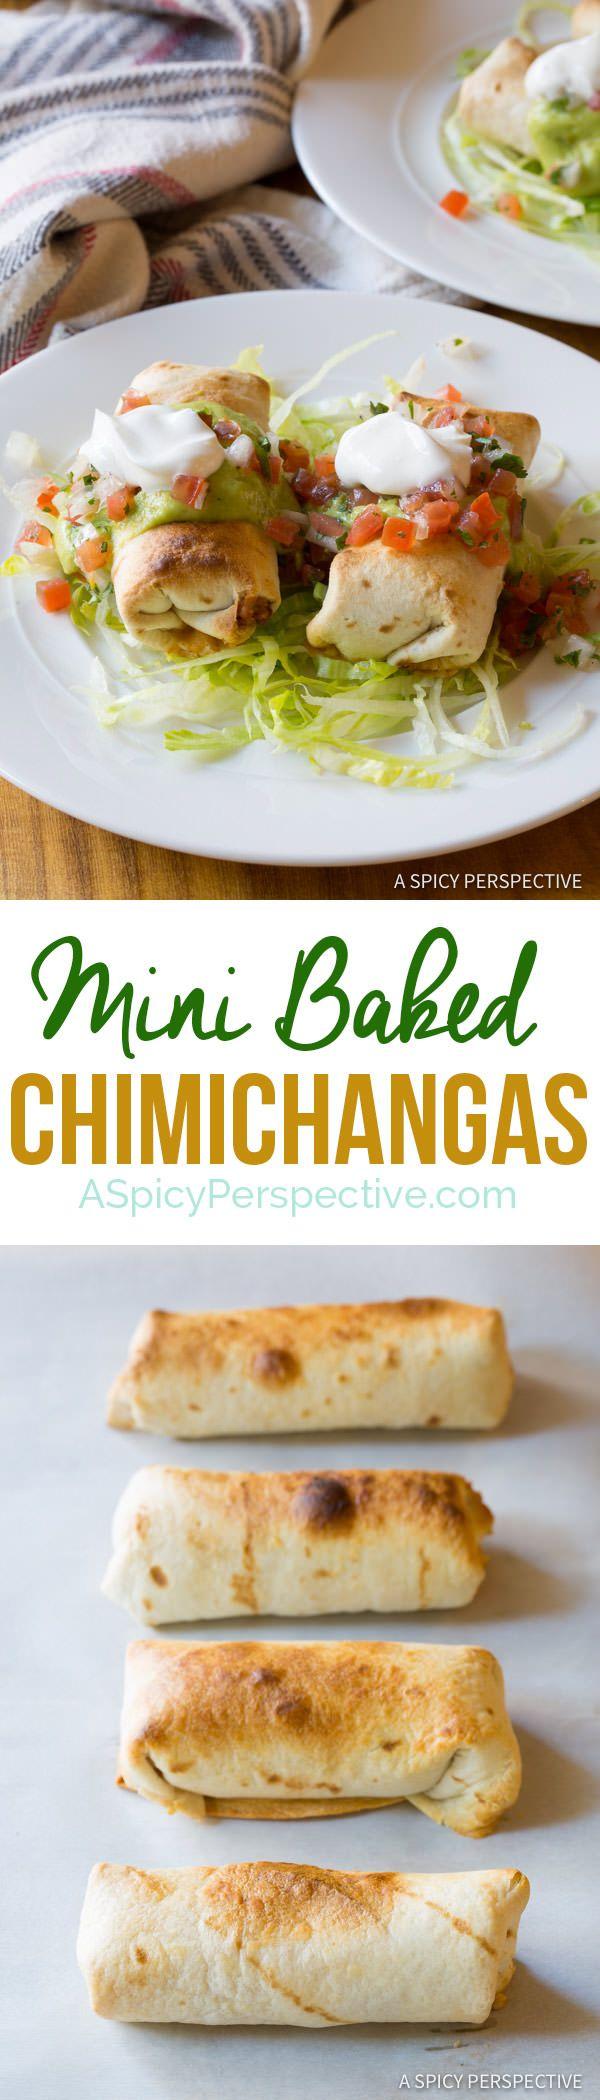 Lightened-Up Mini Baked Chimichanga Recipe | ASpicyPerspective.com